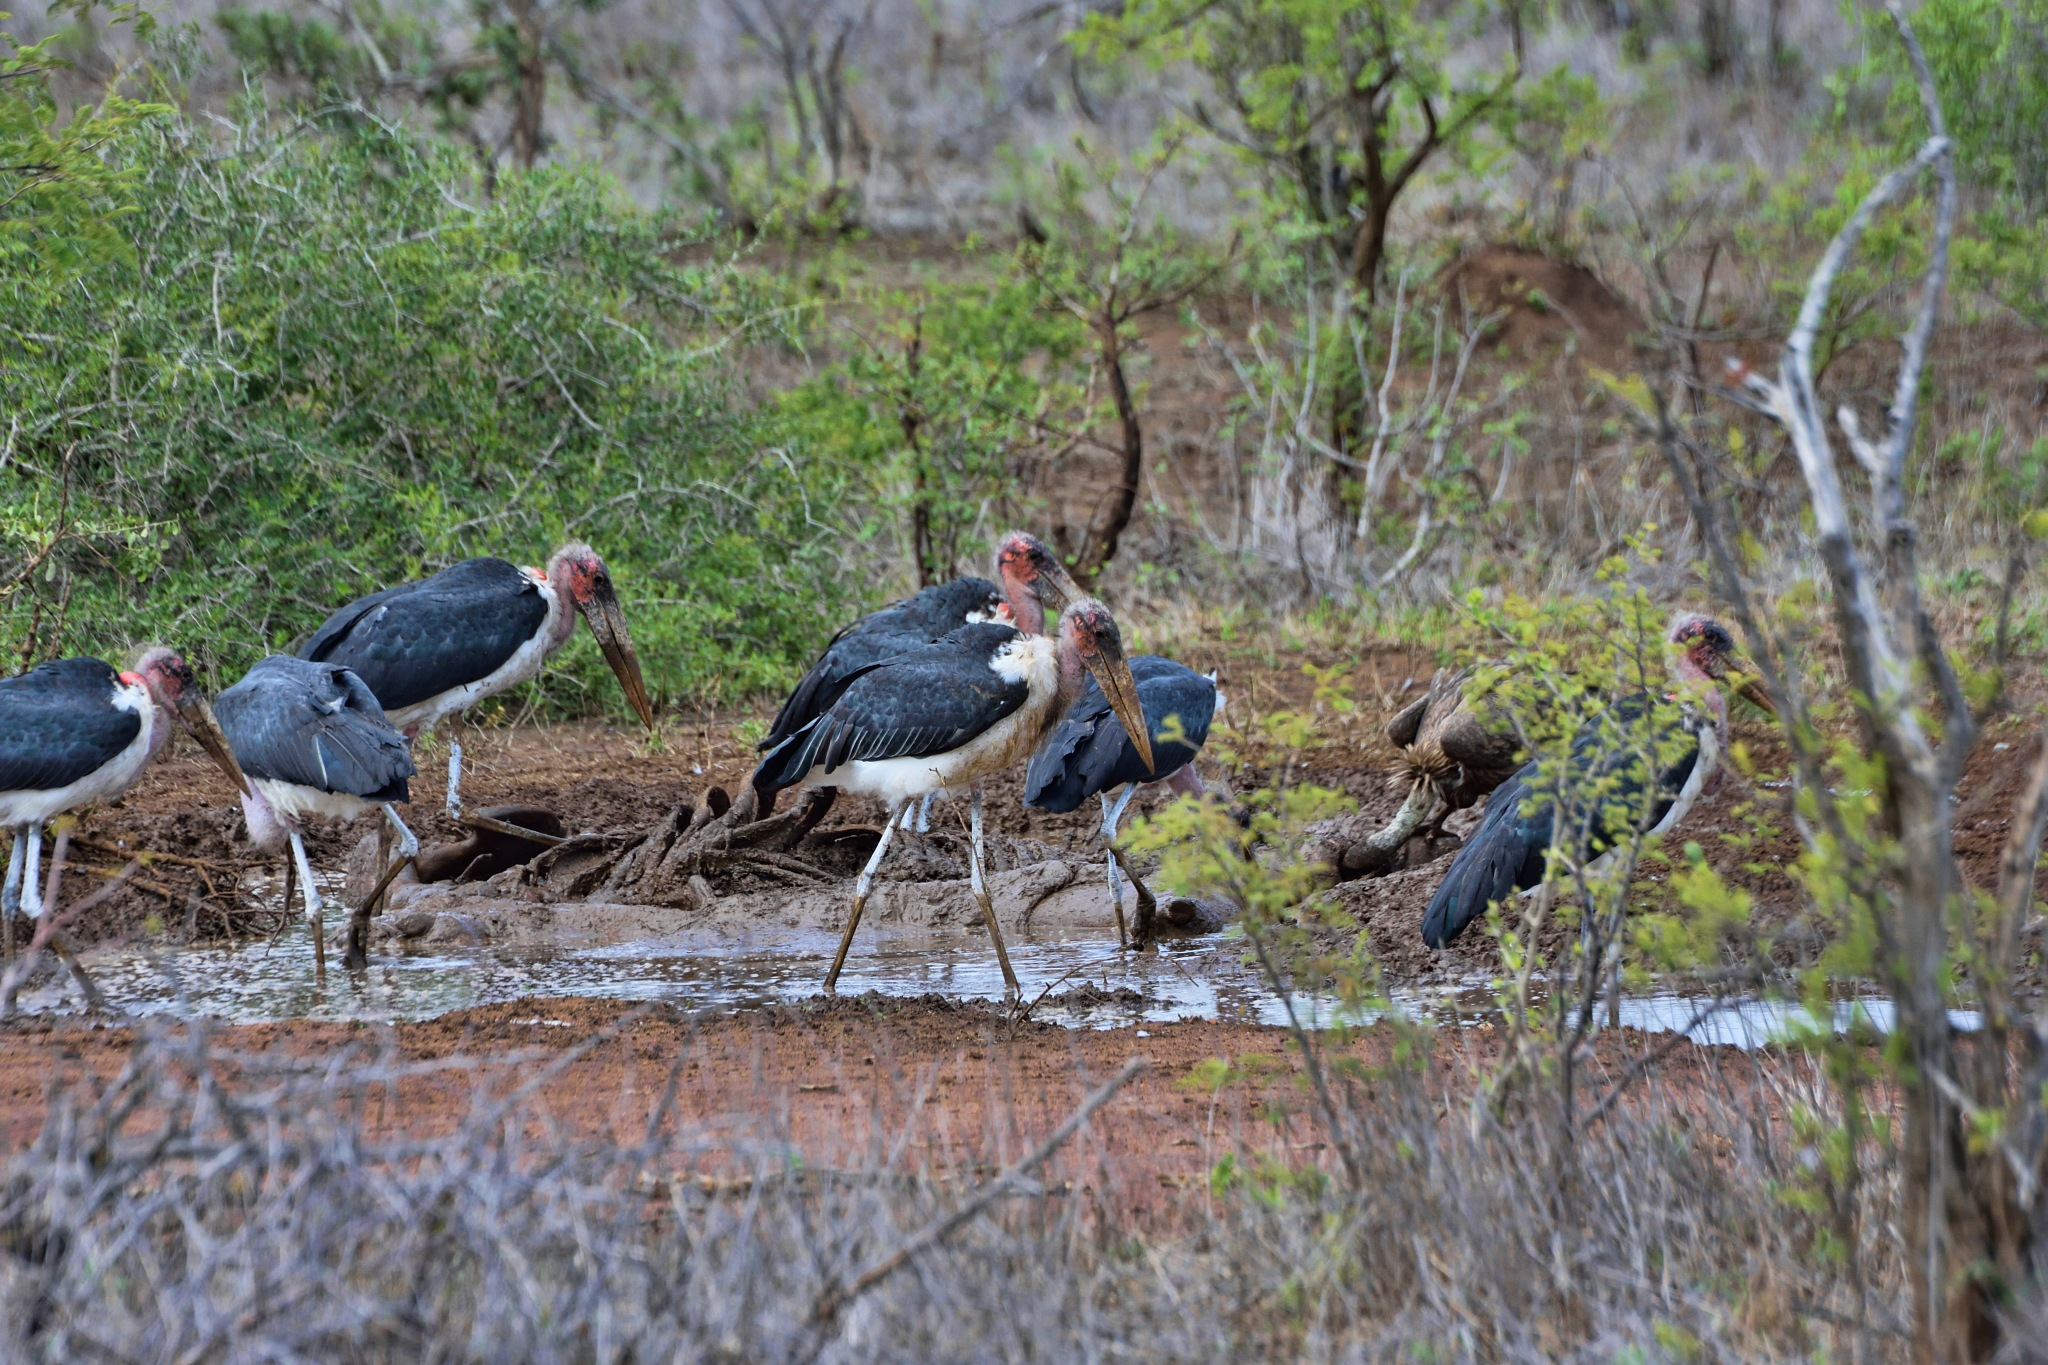 South Africa - Kruger Park (166) Marabou Storks and a White Backed Vulture by Derek Clarke